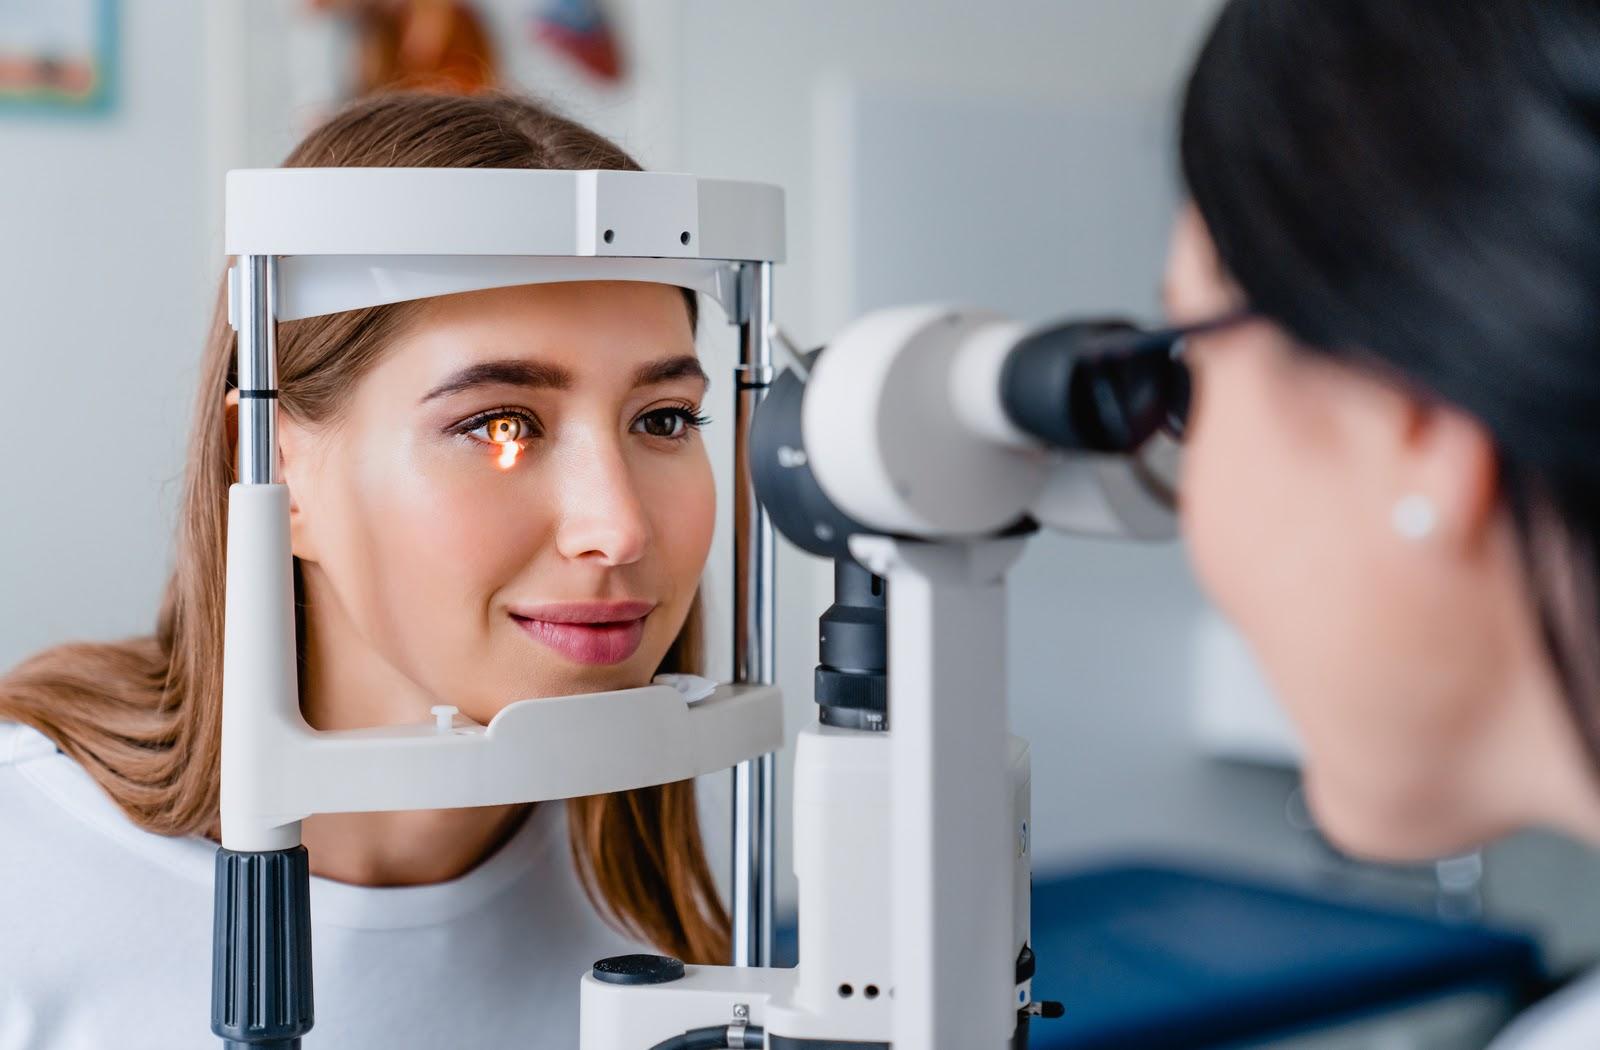 Young women undergoing eye exam by her optometrist